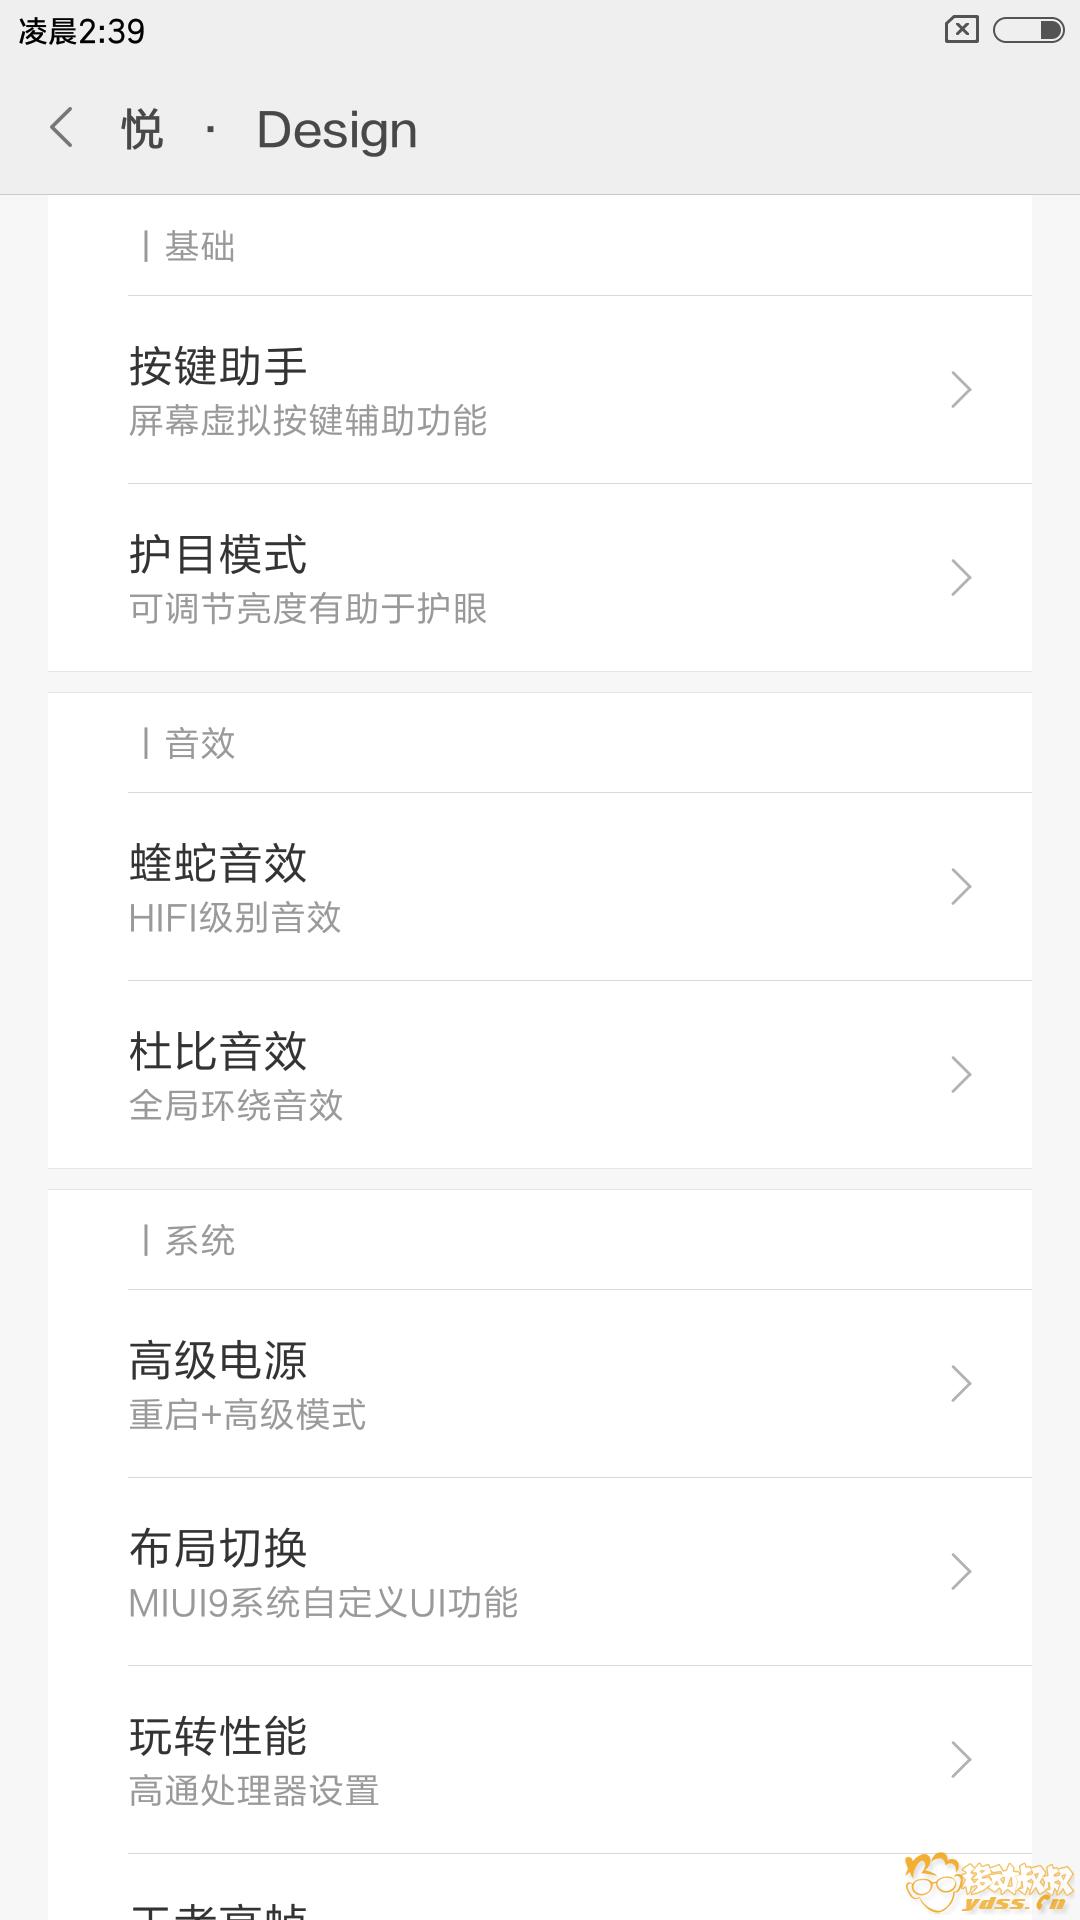 Screenshot_2018-01-04-02-39-34-630_com.mrxy.design.png